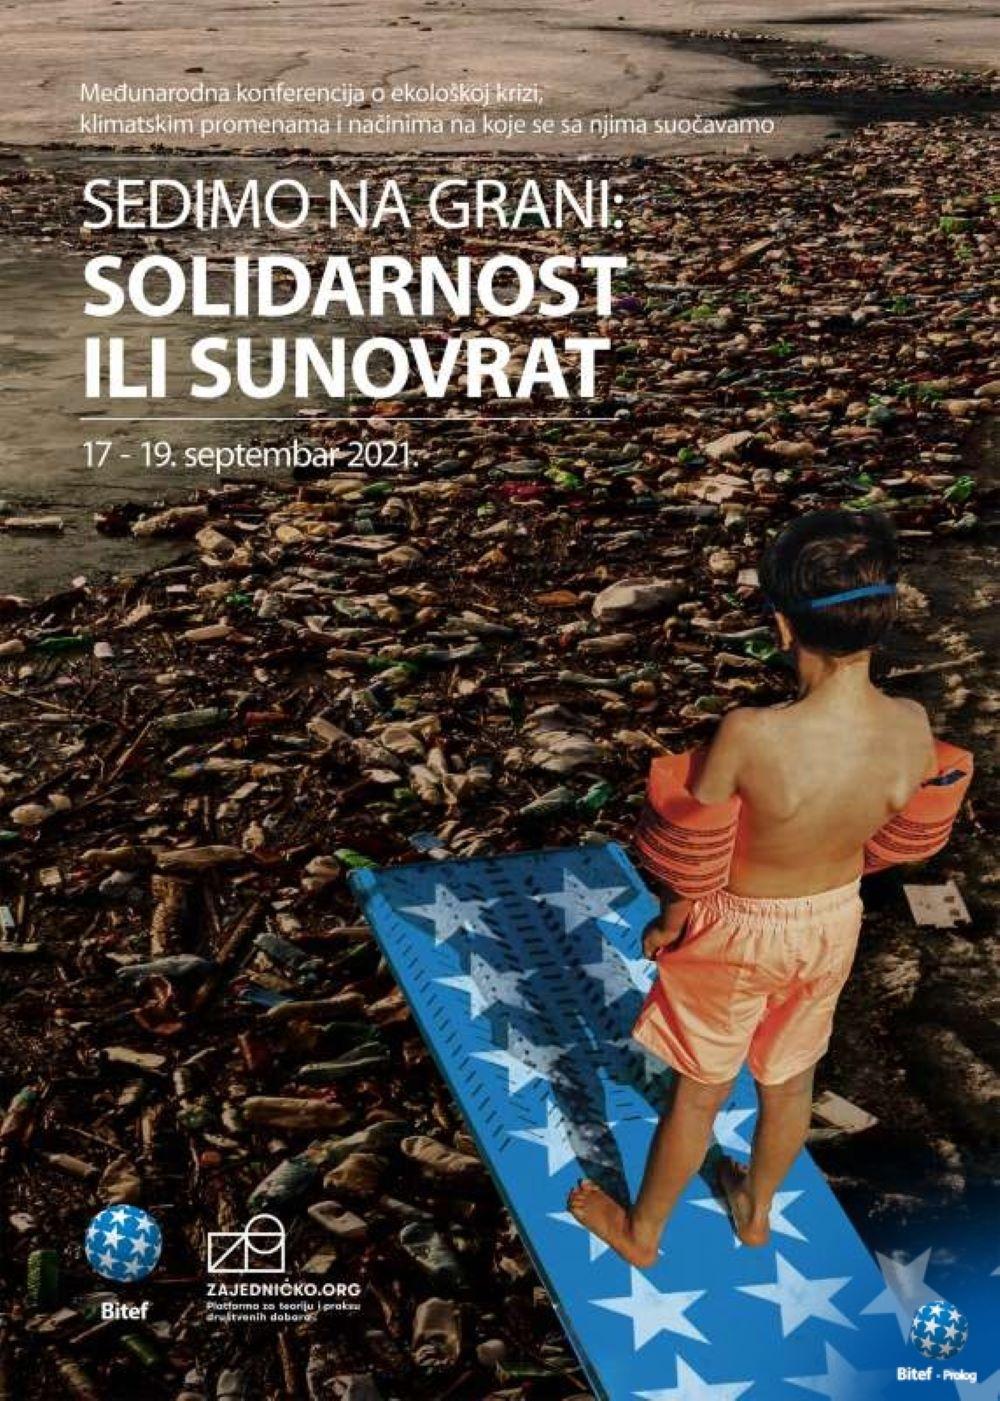 Sedimo na grani: solidarnost ili sunovrat